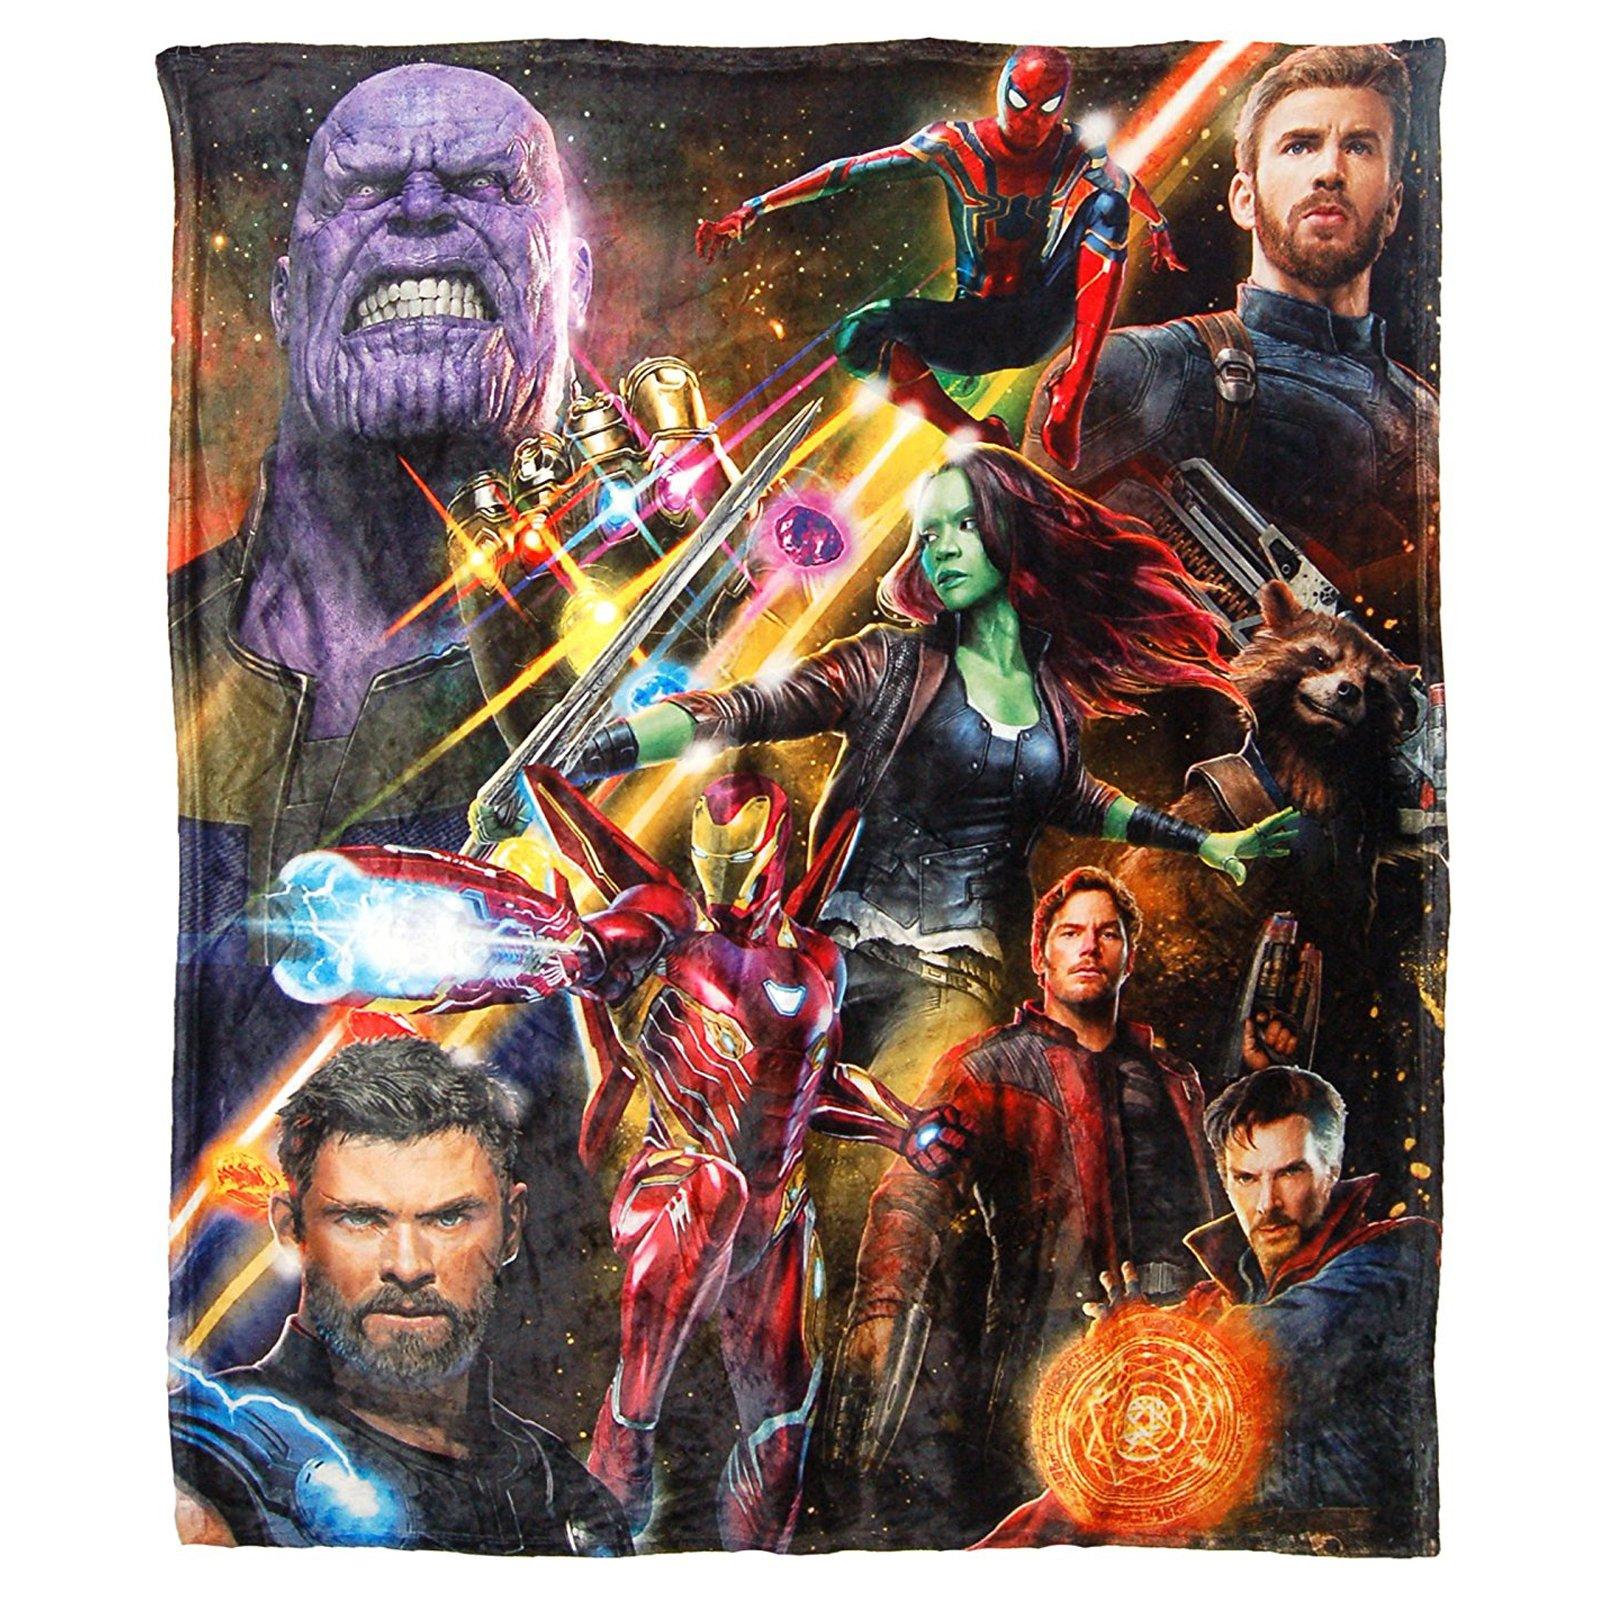 Marvel Avengers Infinity War Fleece Throw Blanket Kids Home Decor 45 x 60 Inch